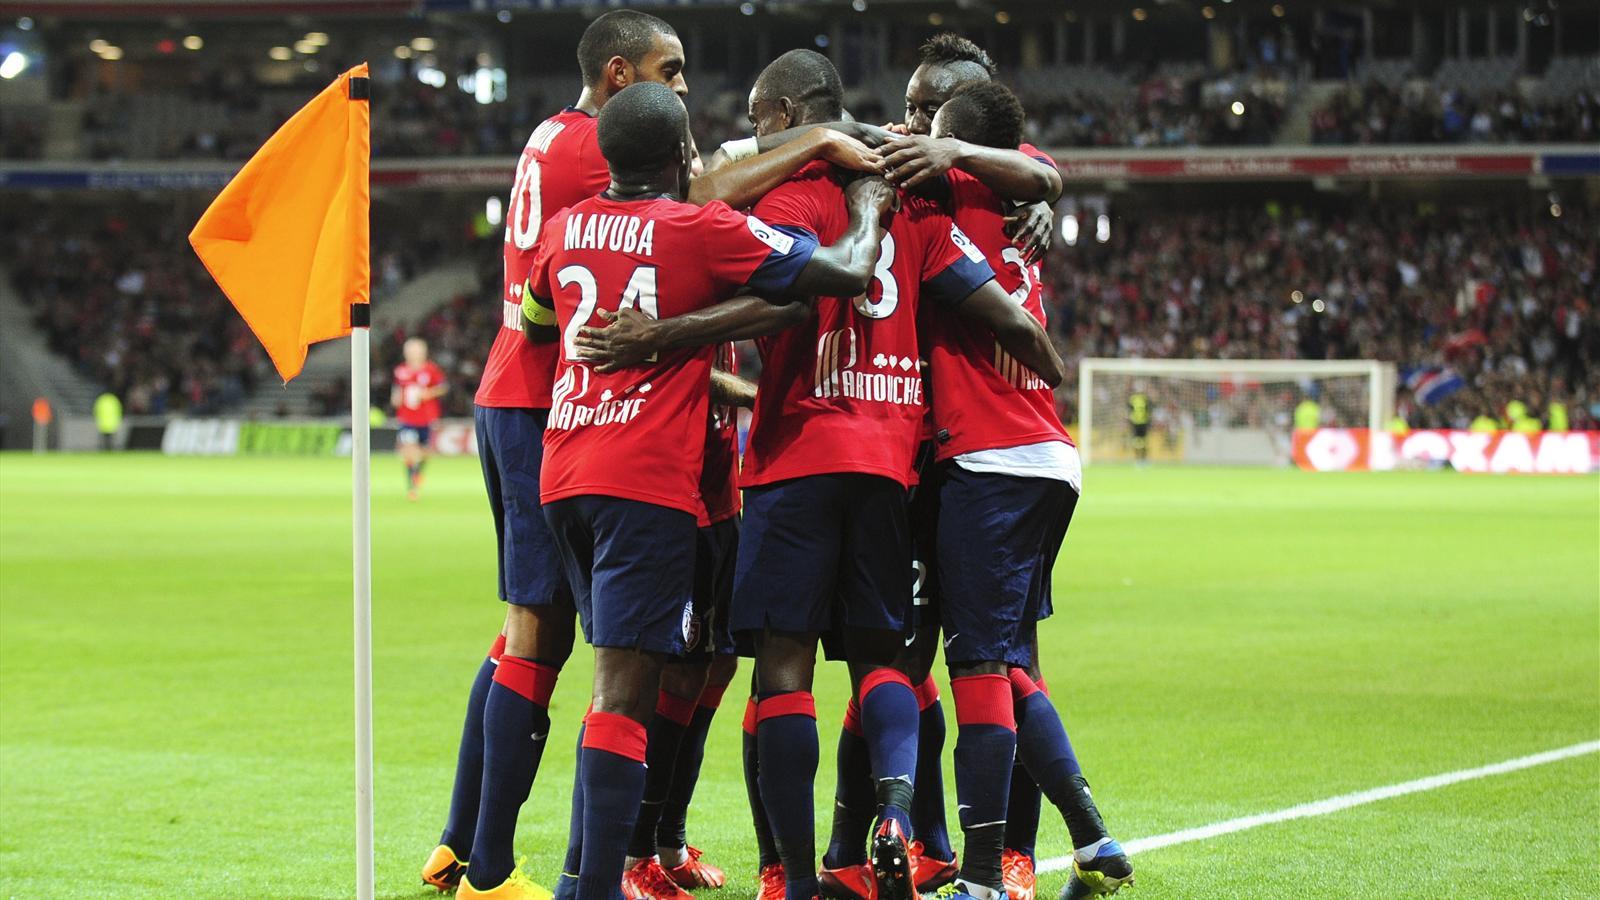 Match LOSC Lille vs AS Saint-Etienne en direct live streaming